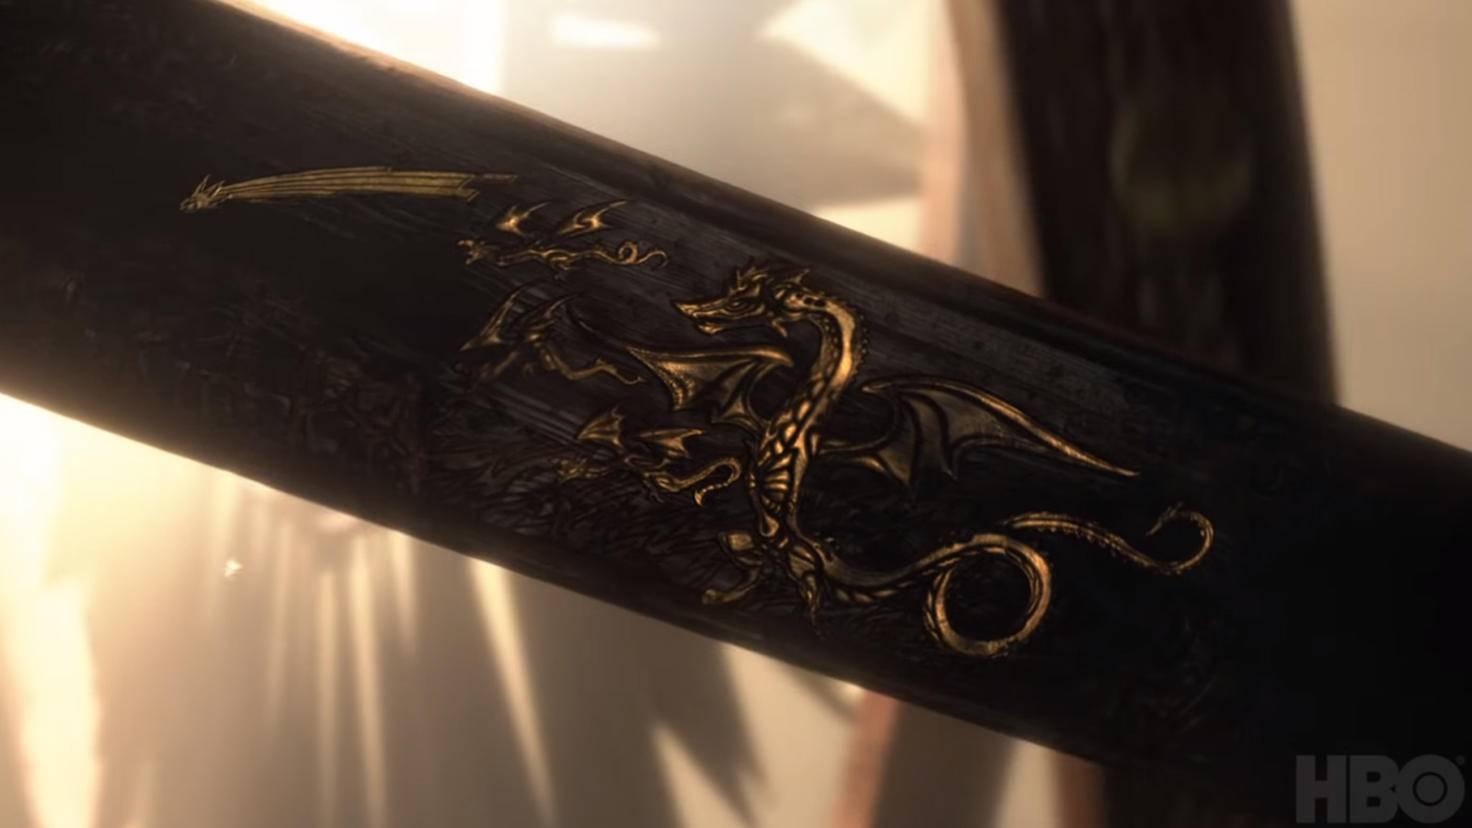 7-Game of Thrones Intro-Drachen